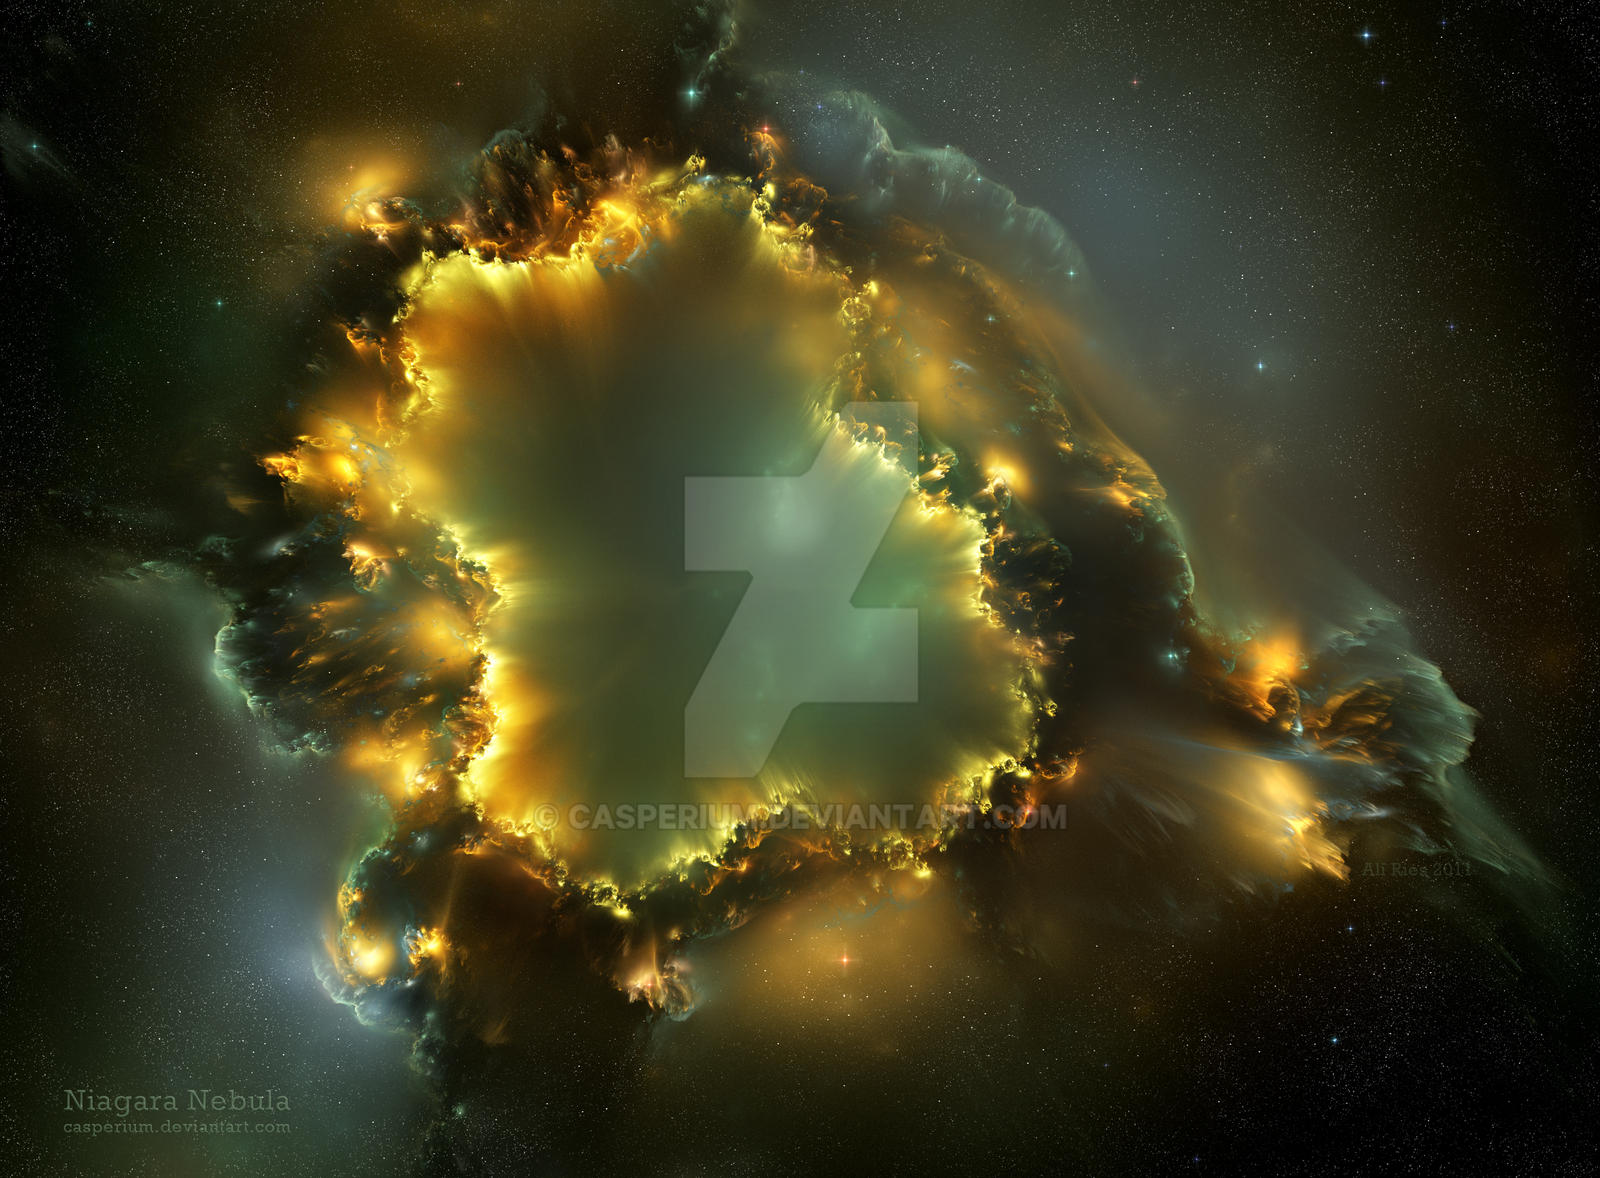 Niagara Nebula by Casperium